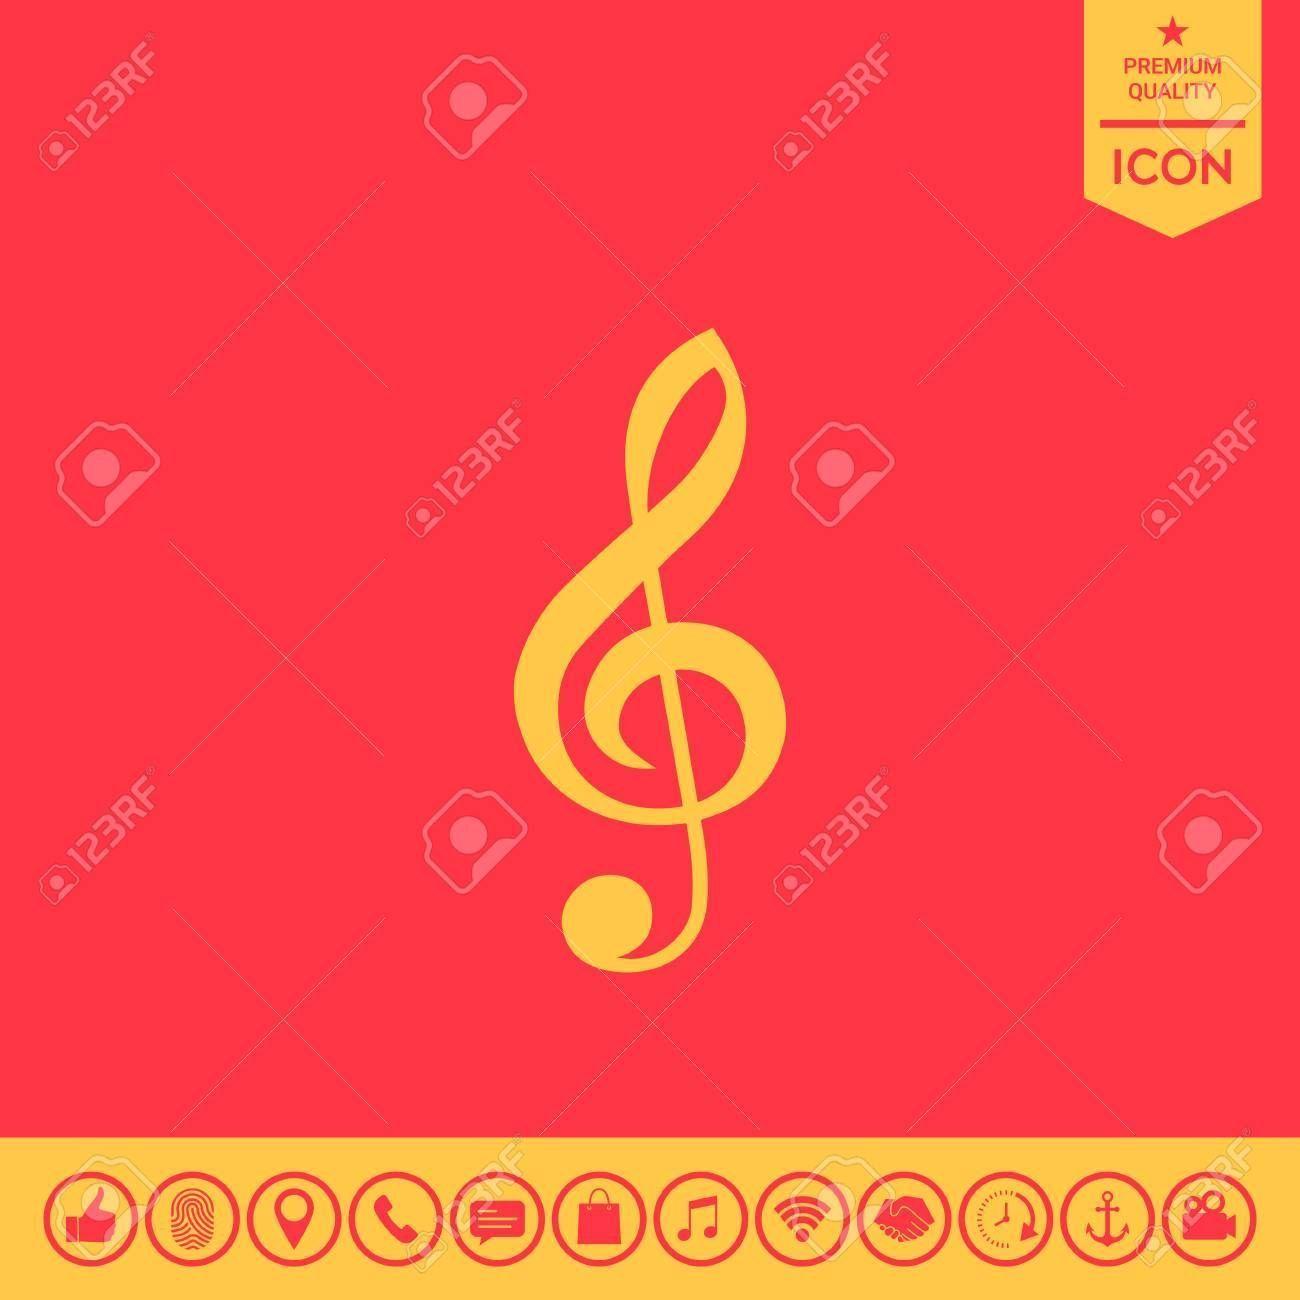 Treble clef icon. , #Ad, #Treble, #clef, #icon #trebleclef Treble clef icon. , #Ad, #Treble, #clef, #icon #trebleclef Treble clef icon. , #Ad, #Treble, #clef, #icon #trebleclef Treble clef icon. , #Ad, #Treble, #clef, #icon #trebleclef Treble clef icon. , #Ad, #Treble, #clef, #icon #trebleclef Treble clef icon. , #Ad, #Treble, #clef, #icon #trebleclef Treble clef icon. , #Ad, #Treble, #clef, #icon #trebleclef Treble clef icon. , #Ad, #Treble, #clef, #icon #trebleclef